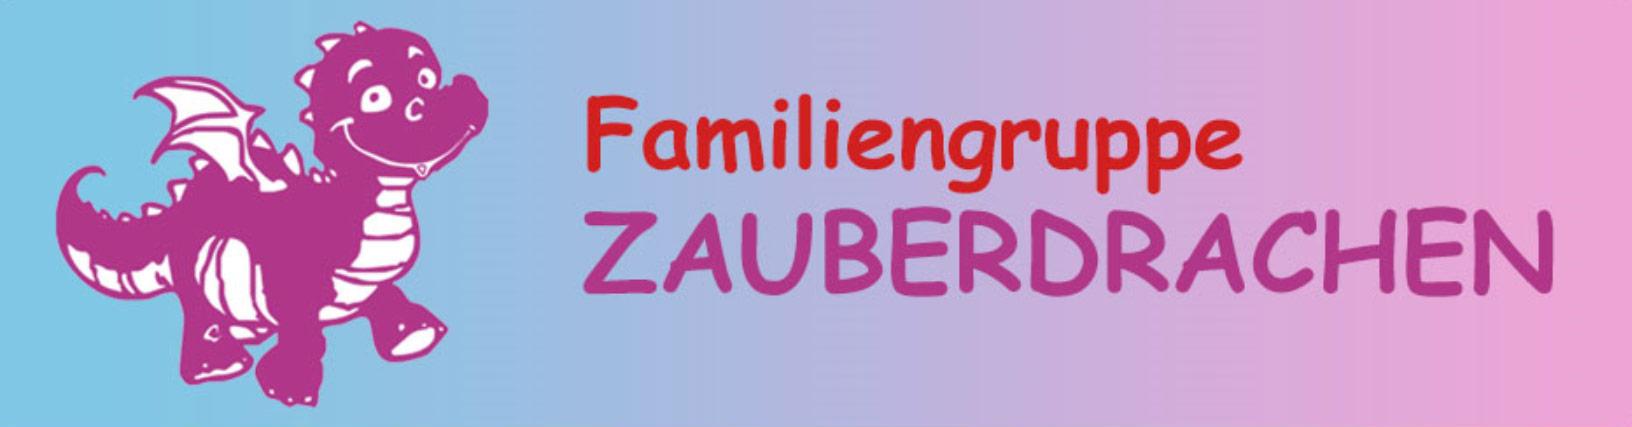 Familiengruppe Zauberdrachen